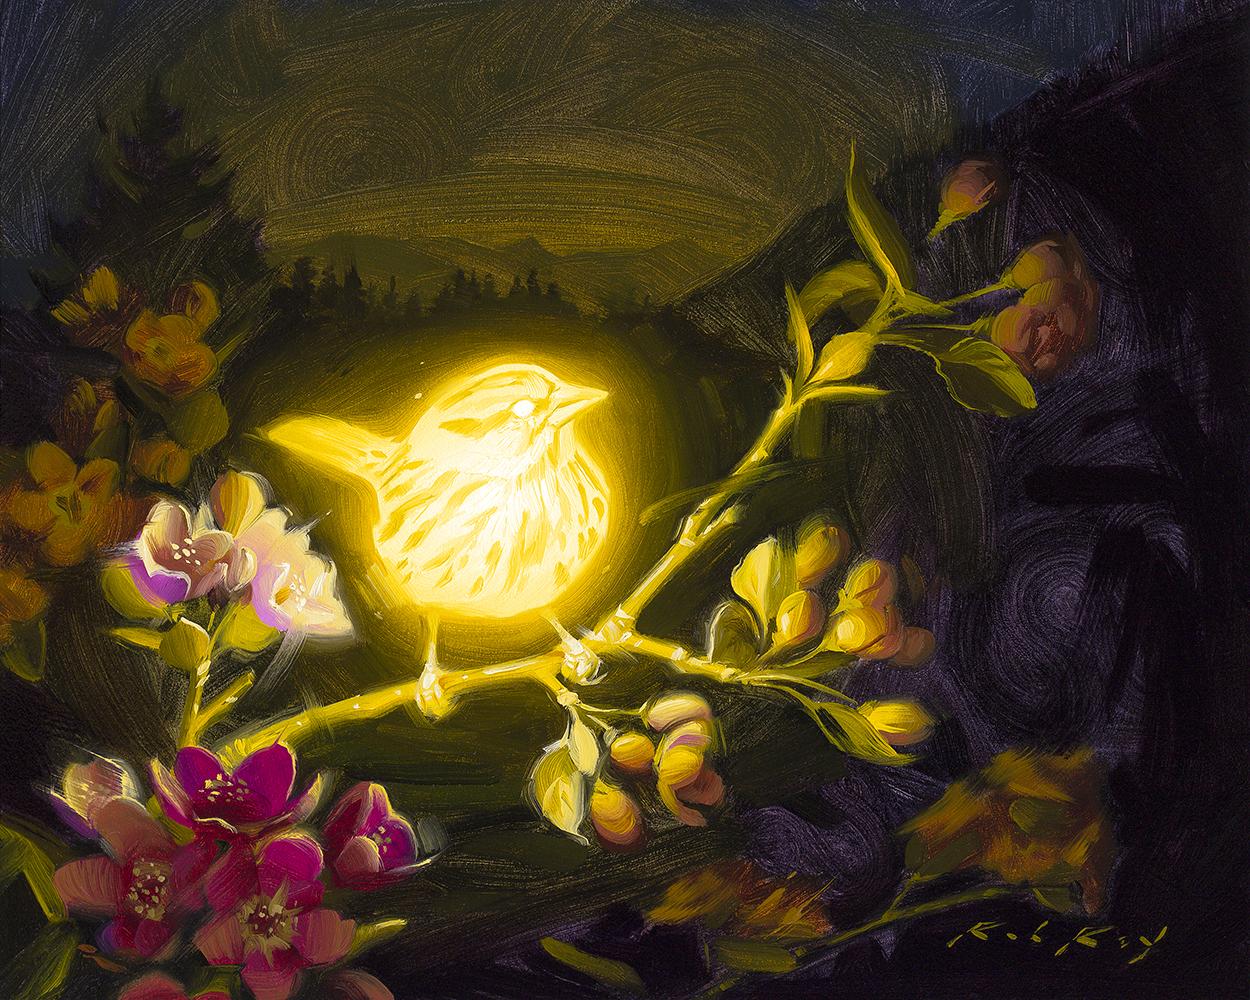 rob_rey_rr1004_bioluminescence_tenacity.jpg